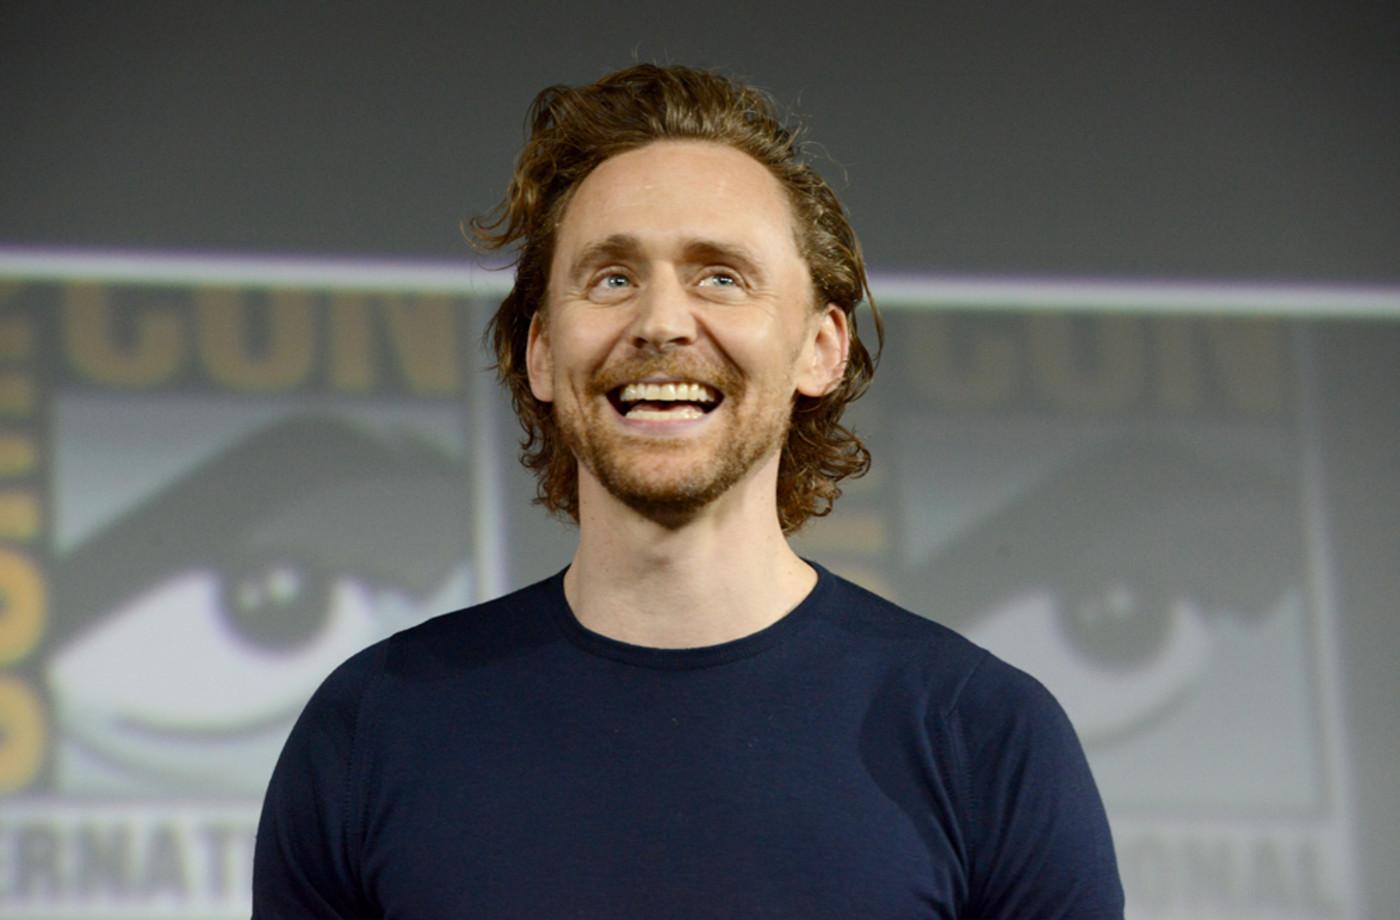 Tom Hiddleston speaks at the Marvel Studios Panel during 2019 Comic-Con